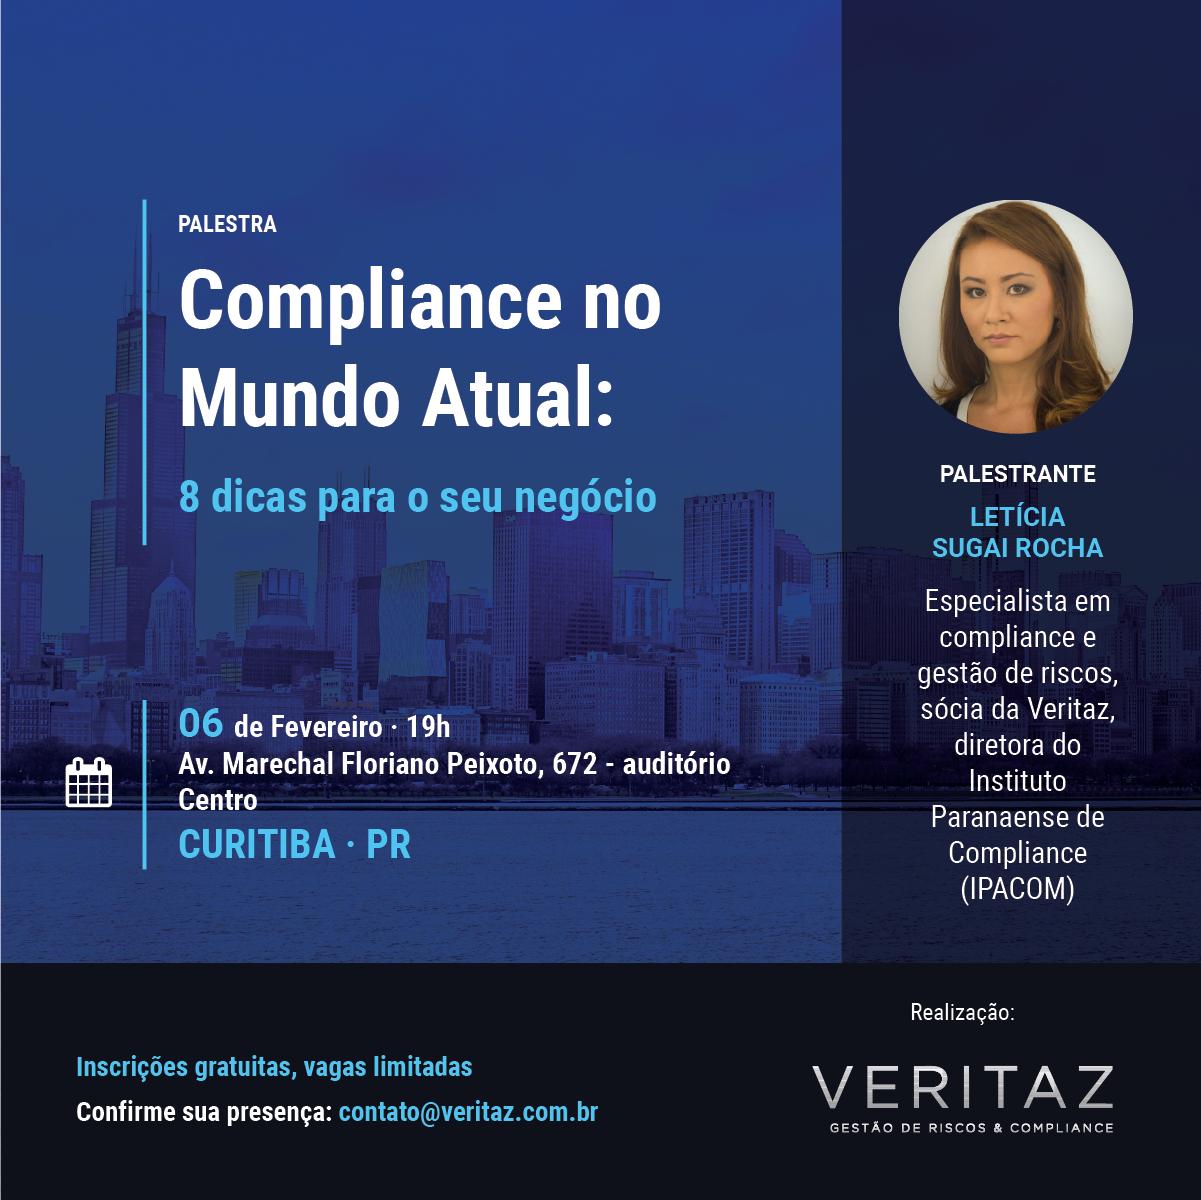 Convite para palestra de compliance da Letícia Sugai e Veritaz